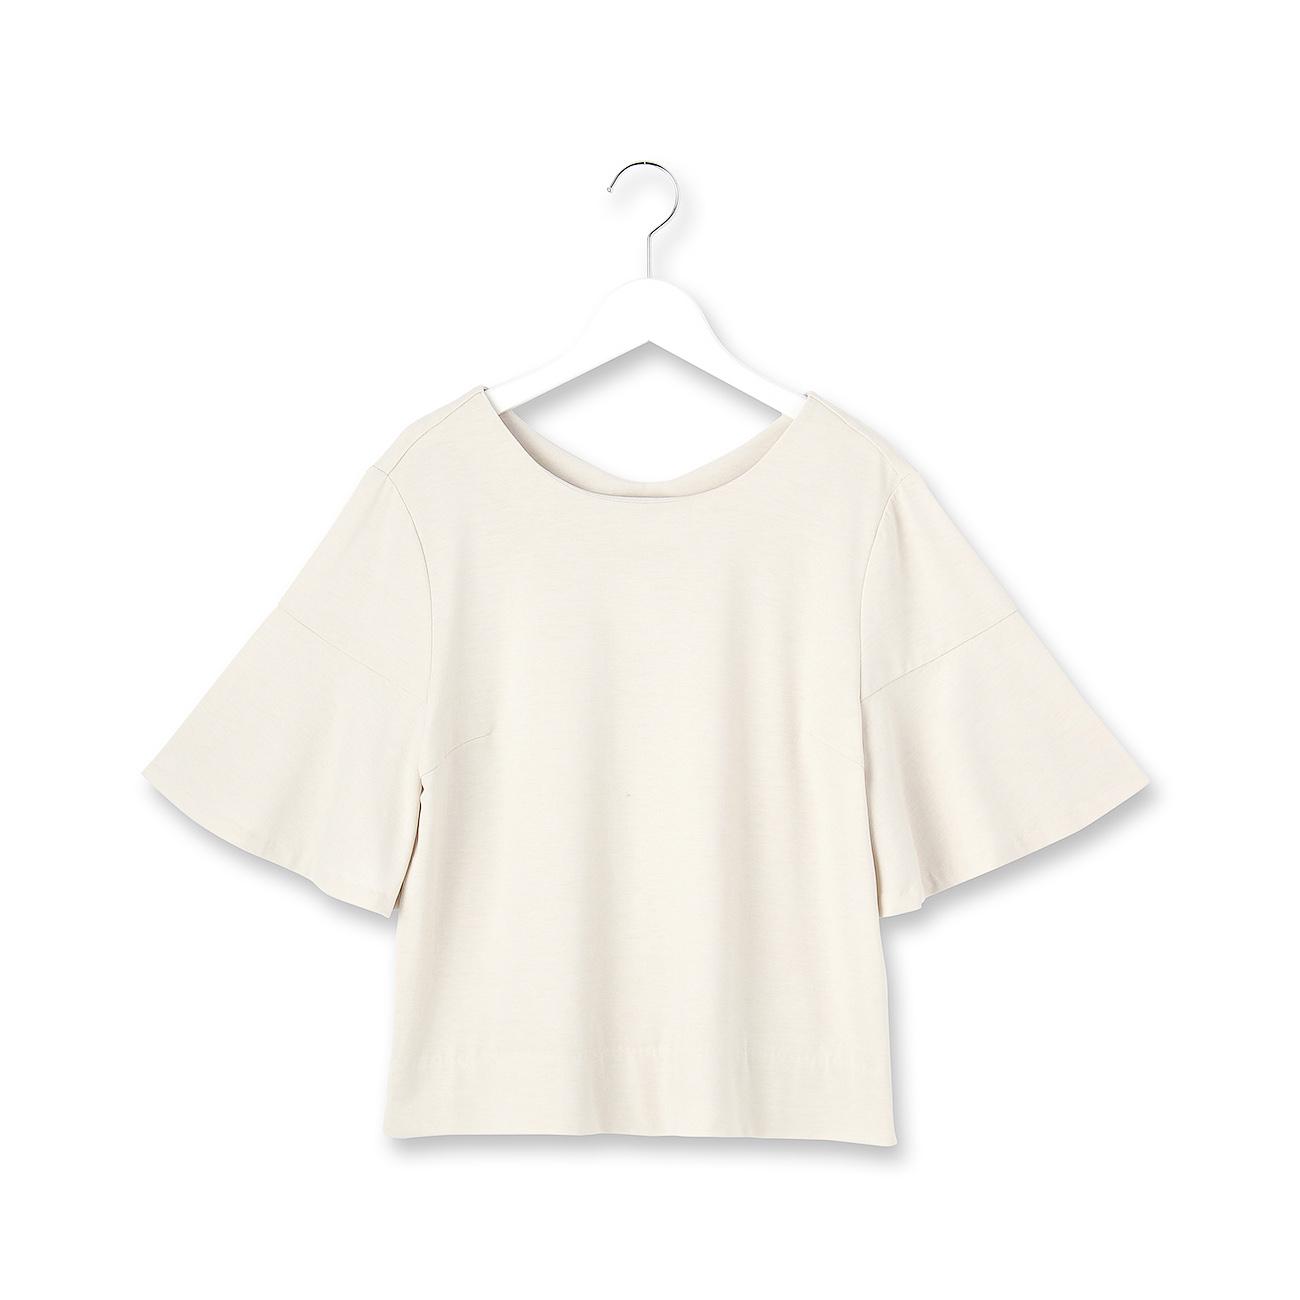 【OPAQUE.CLIP (オペーク ドット クリップ)】フレアスリーブカットソーレディース トップス|カットソー・Tシャツ オフホワイト